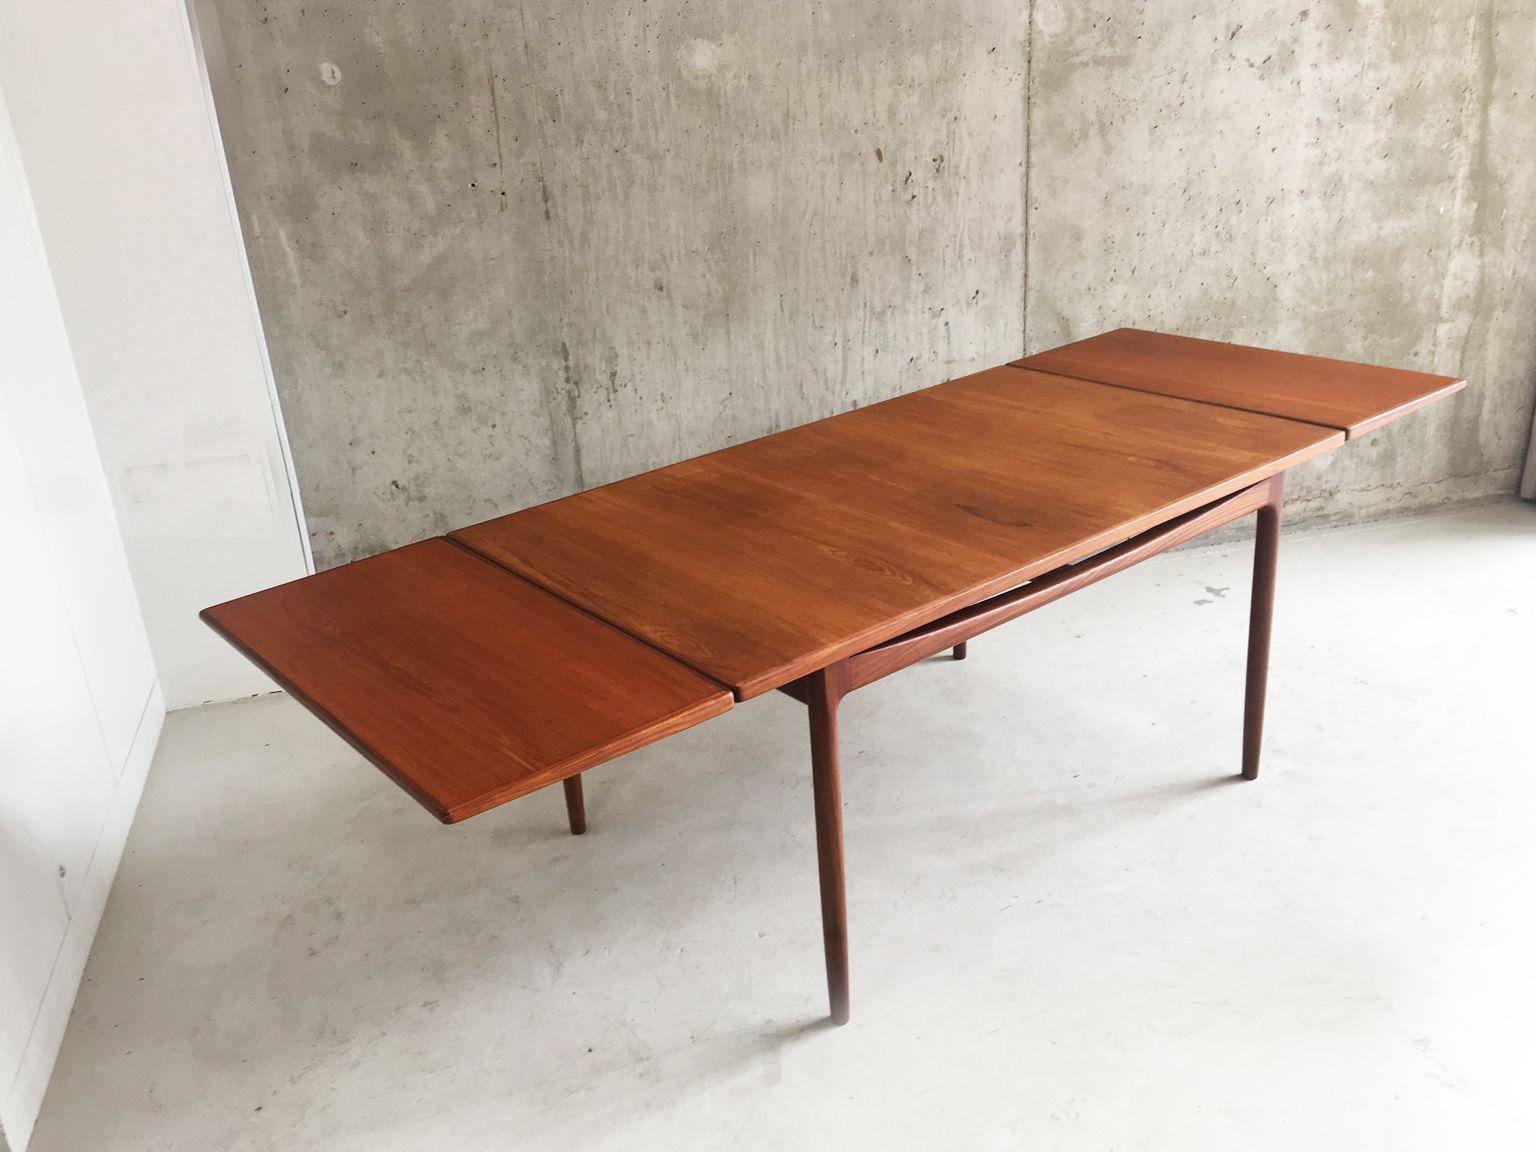 Teak extendable dining table by ib kofod larsen for g plan for G plan teak dining room furniture